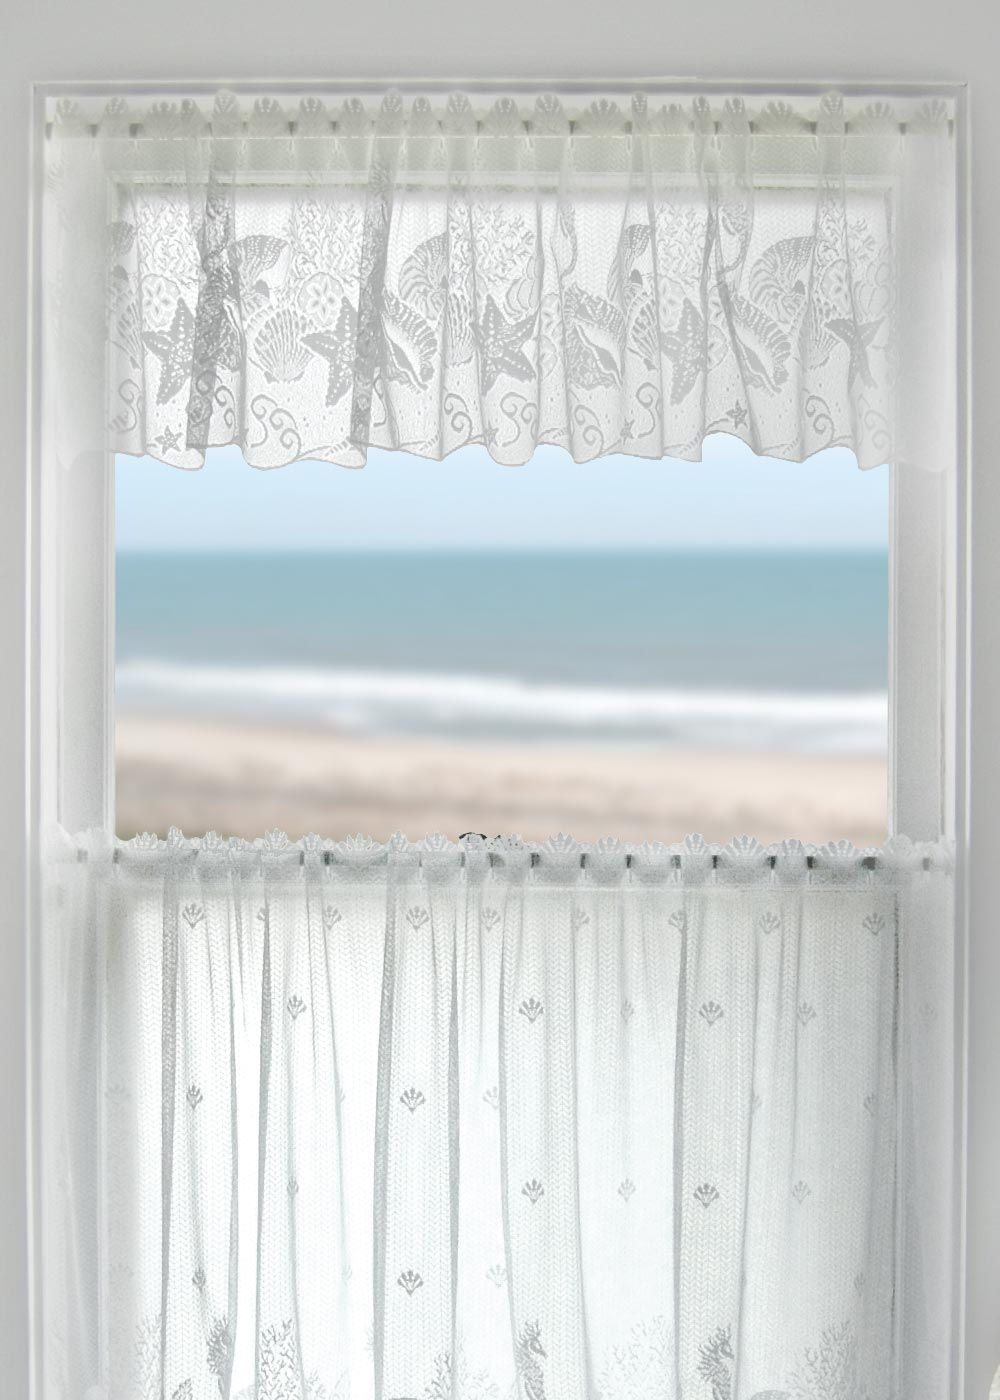 Coastal Seascape Lace Valanceheritage Lace (View 9 of 20)